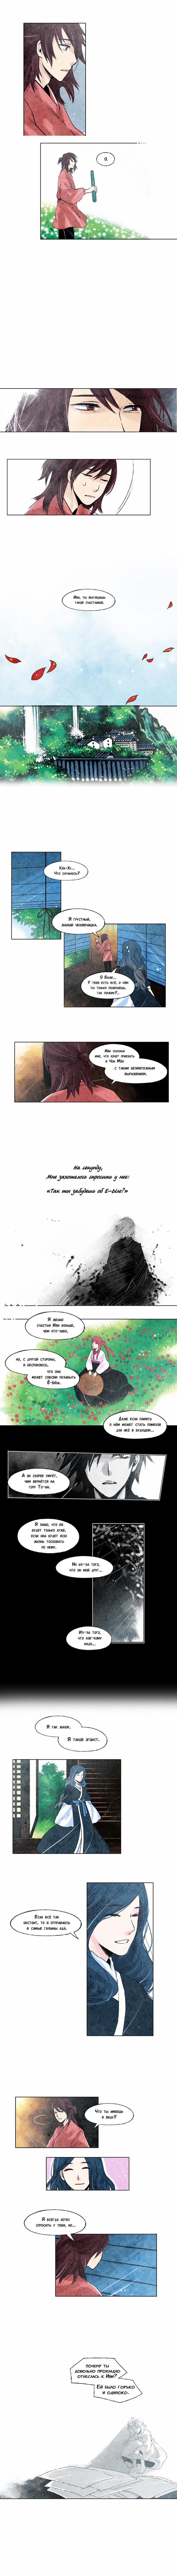 https://r1.ninemanga.com/comics/pic2/39/22503/1257043/154133476862.jpg Page 2